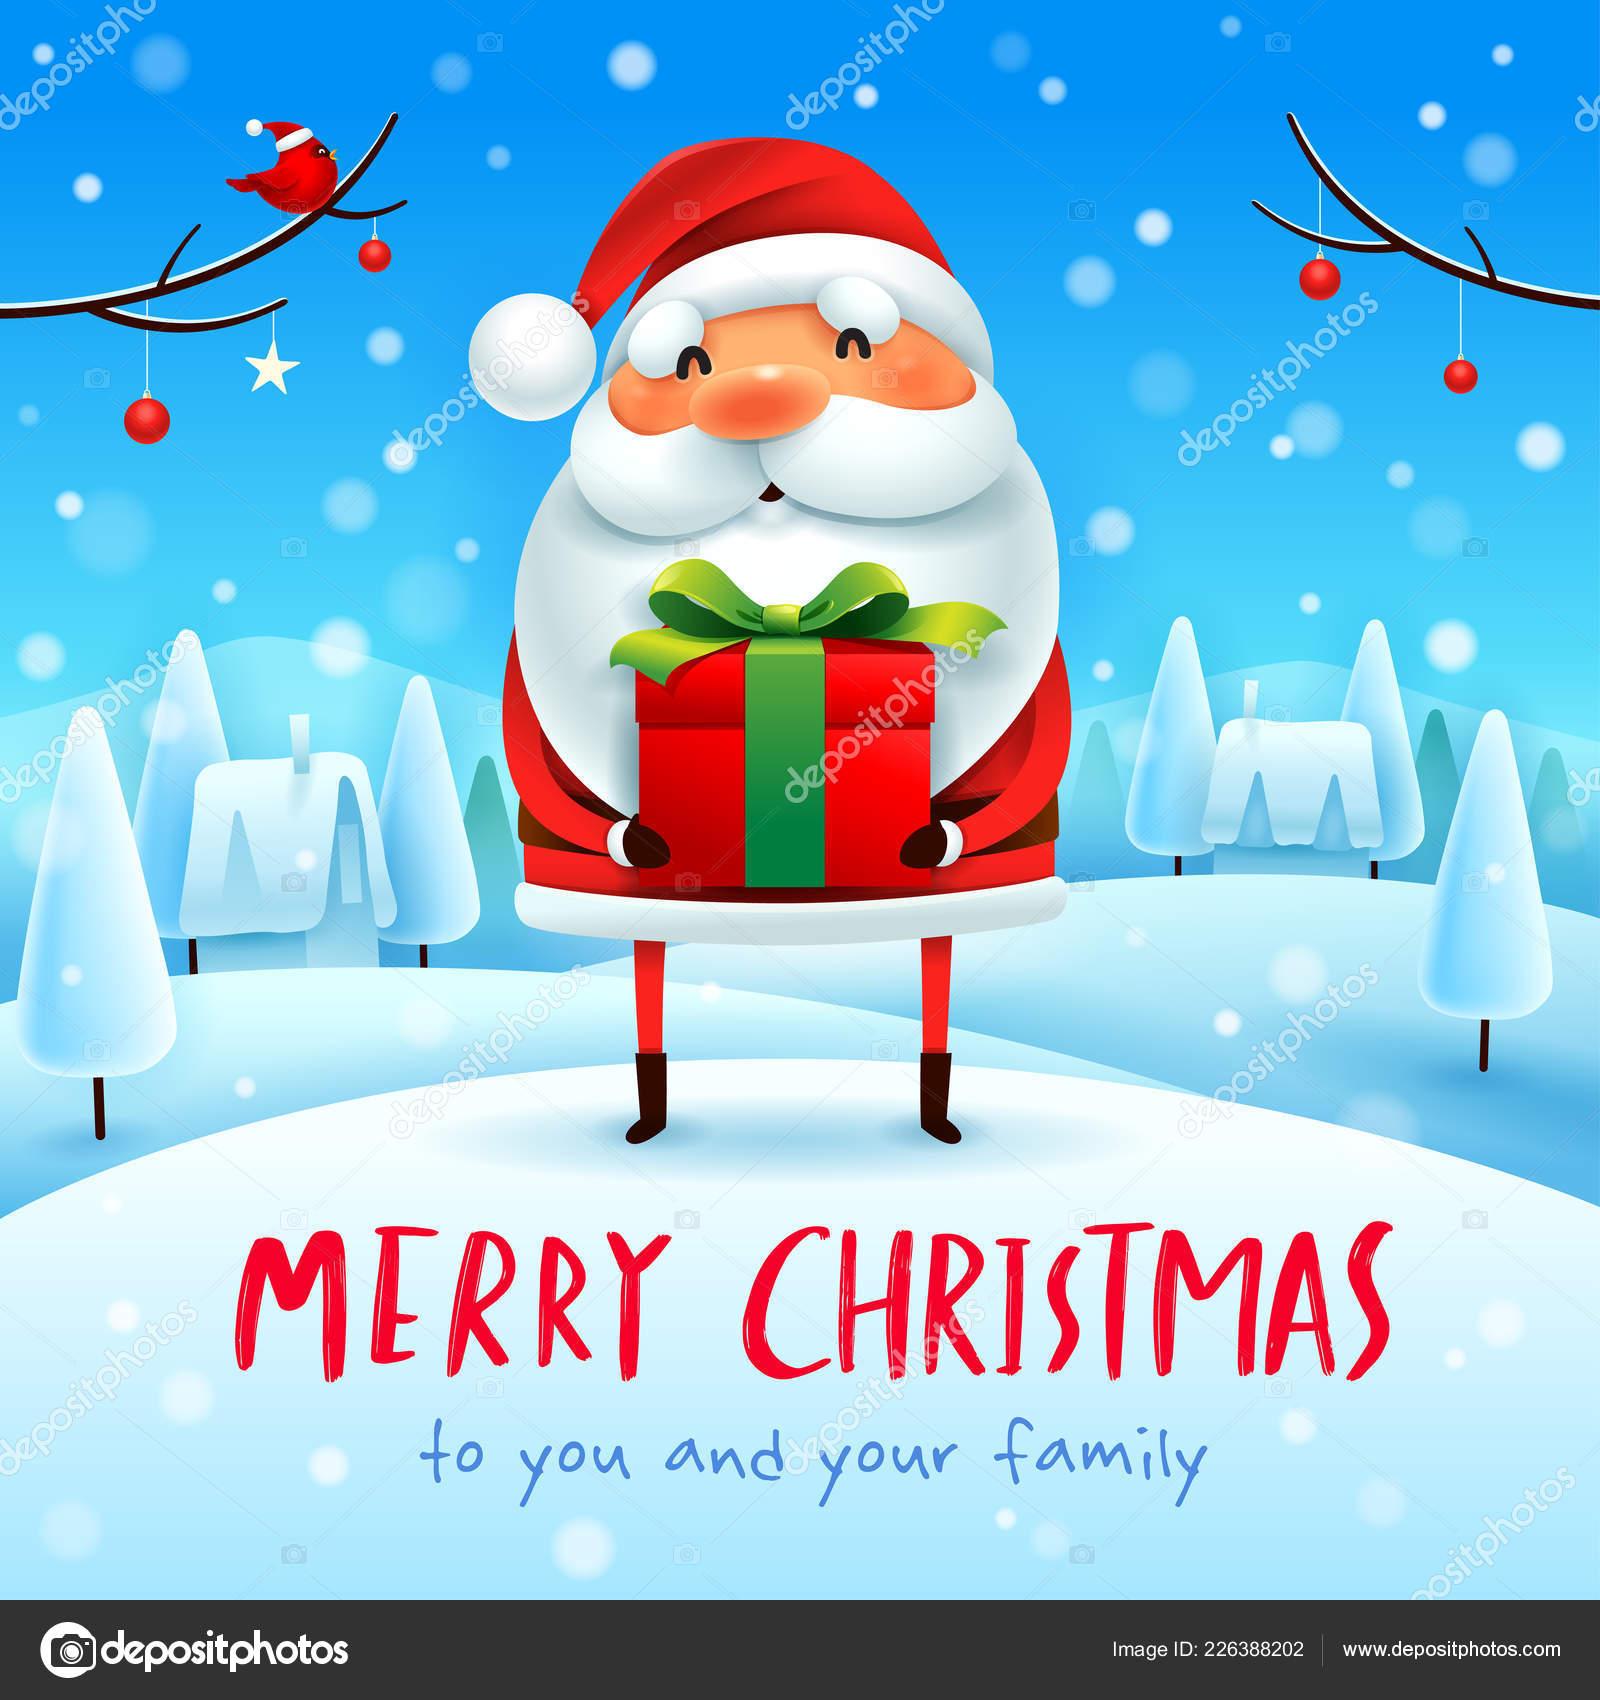 Merry Christmas Santa Claus Gift Present Snow Scene Winter Stock Vector